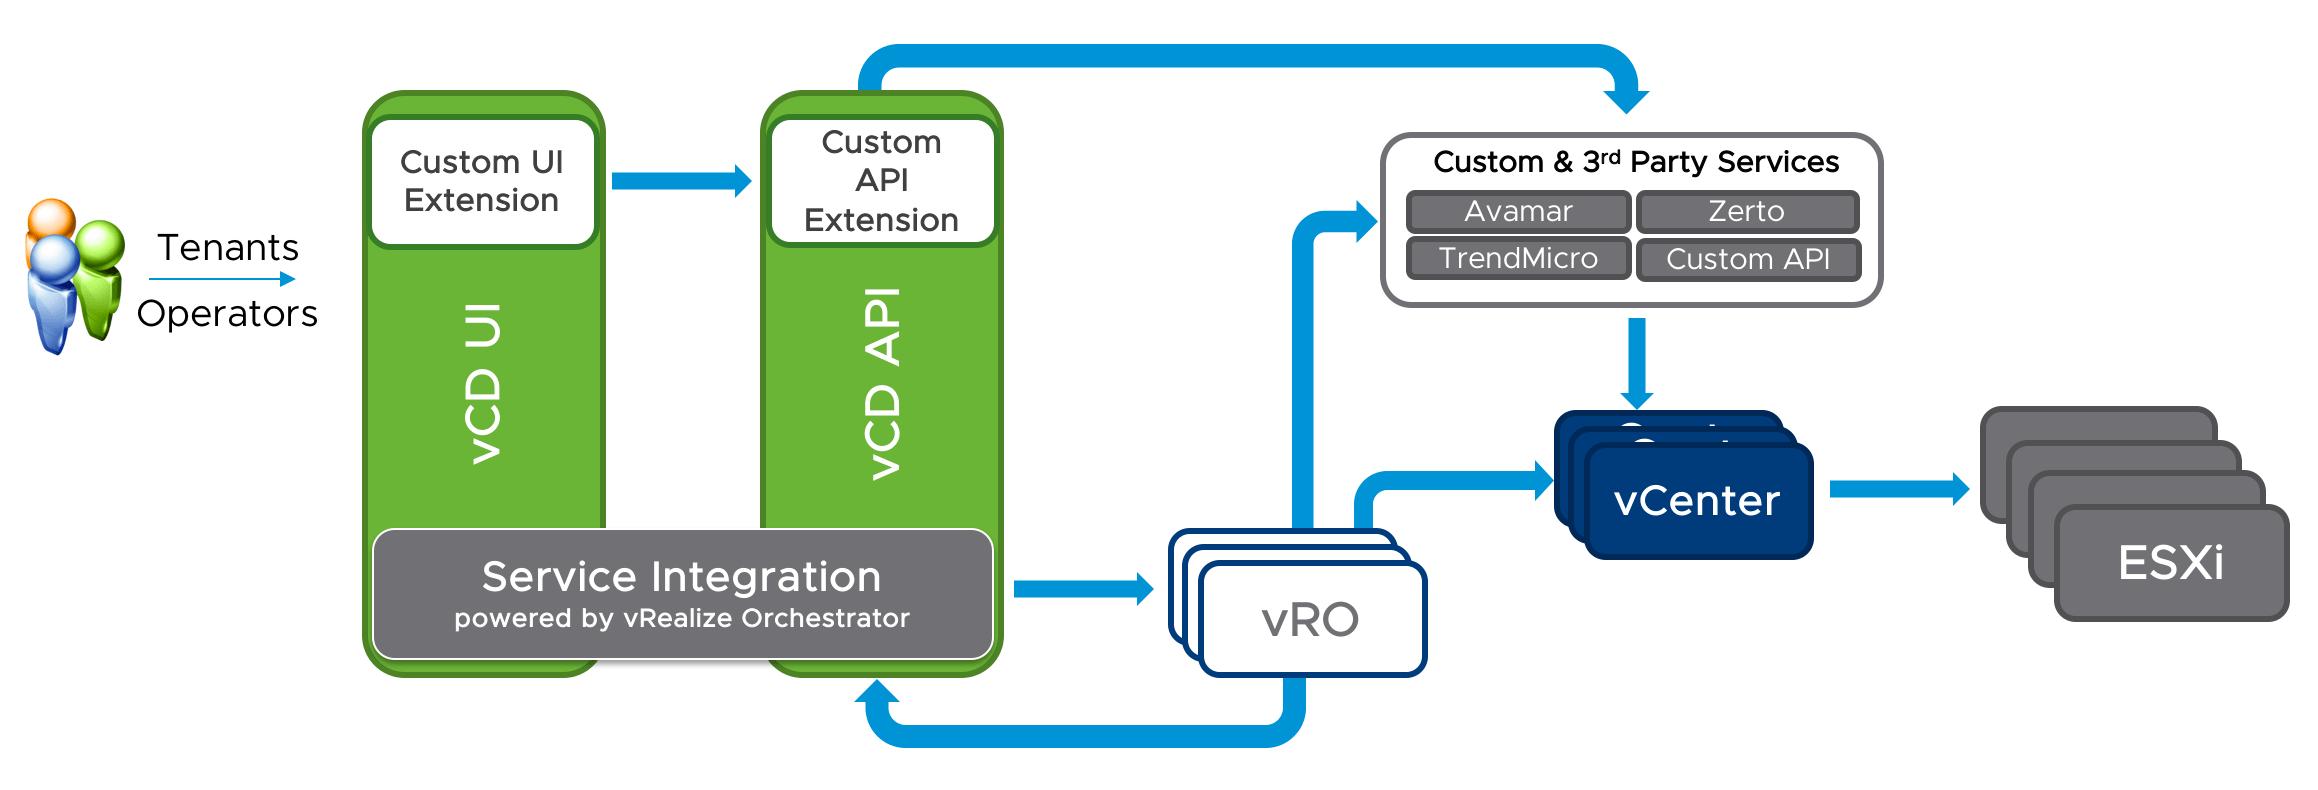 Virtual Vanayr | Virtualization, politics, kids, the usual